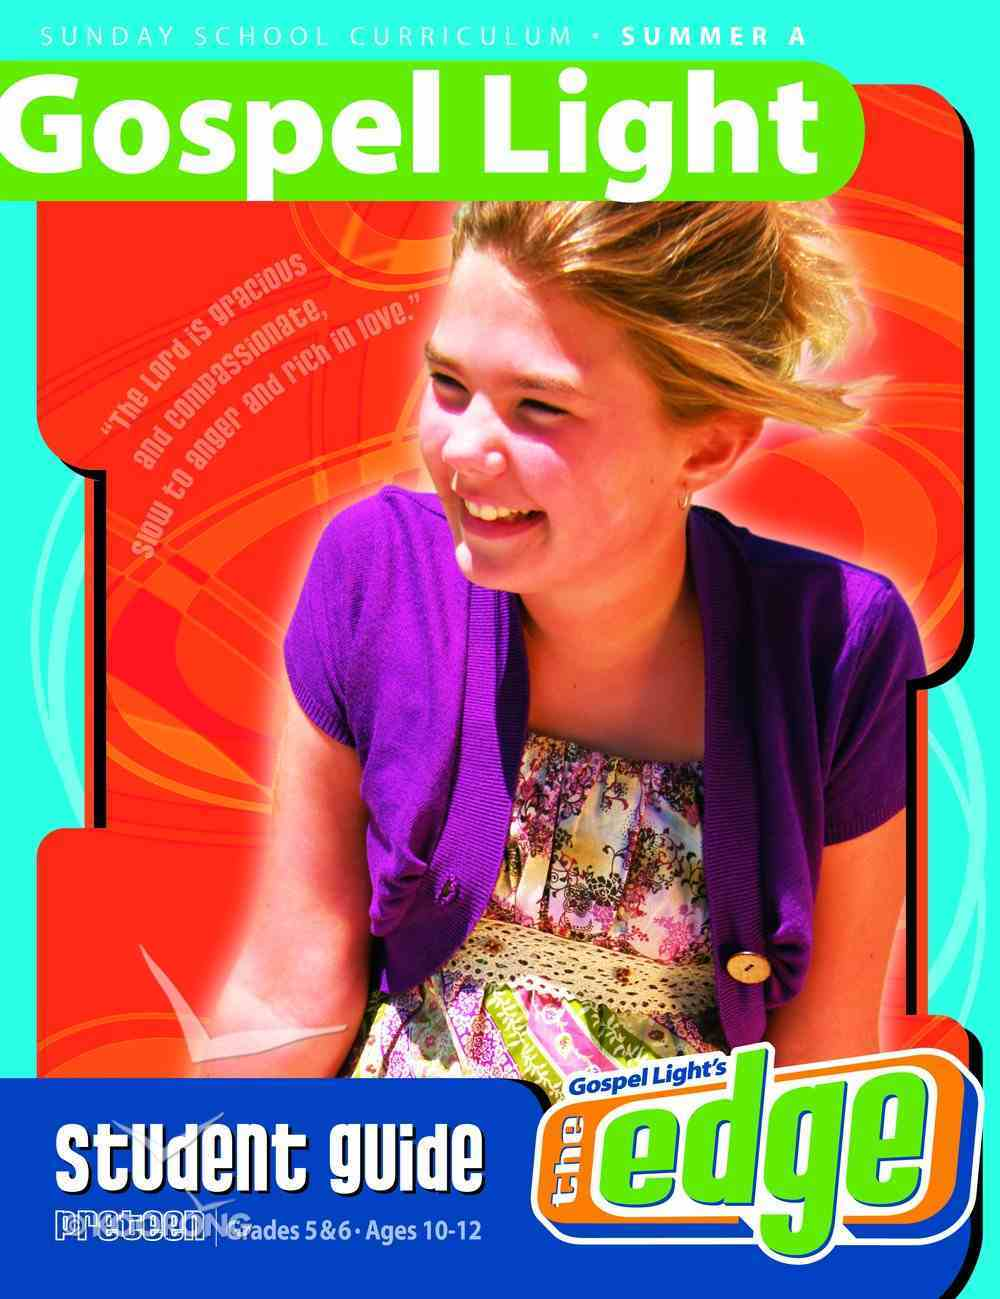 Gllw Summera 2020/2021 Grades 5&6 Ages 10-12 (Student Guide) (Gospel Light Living Word Series) Paperback